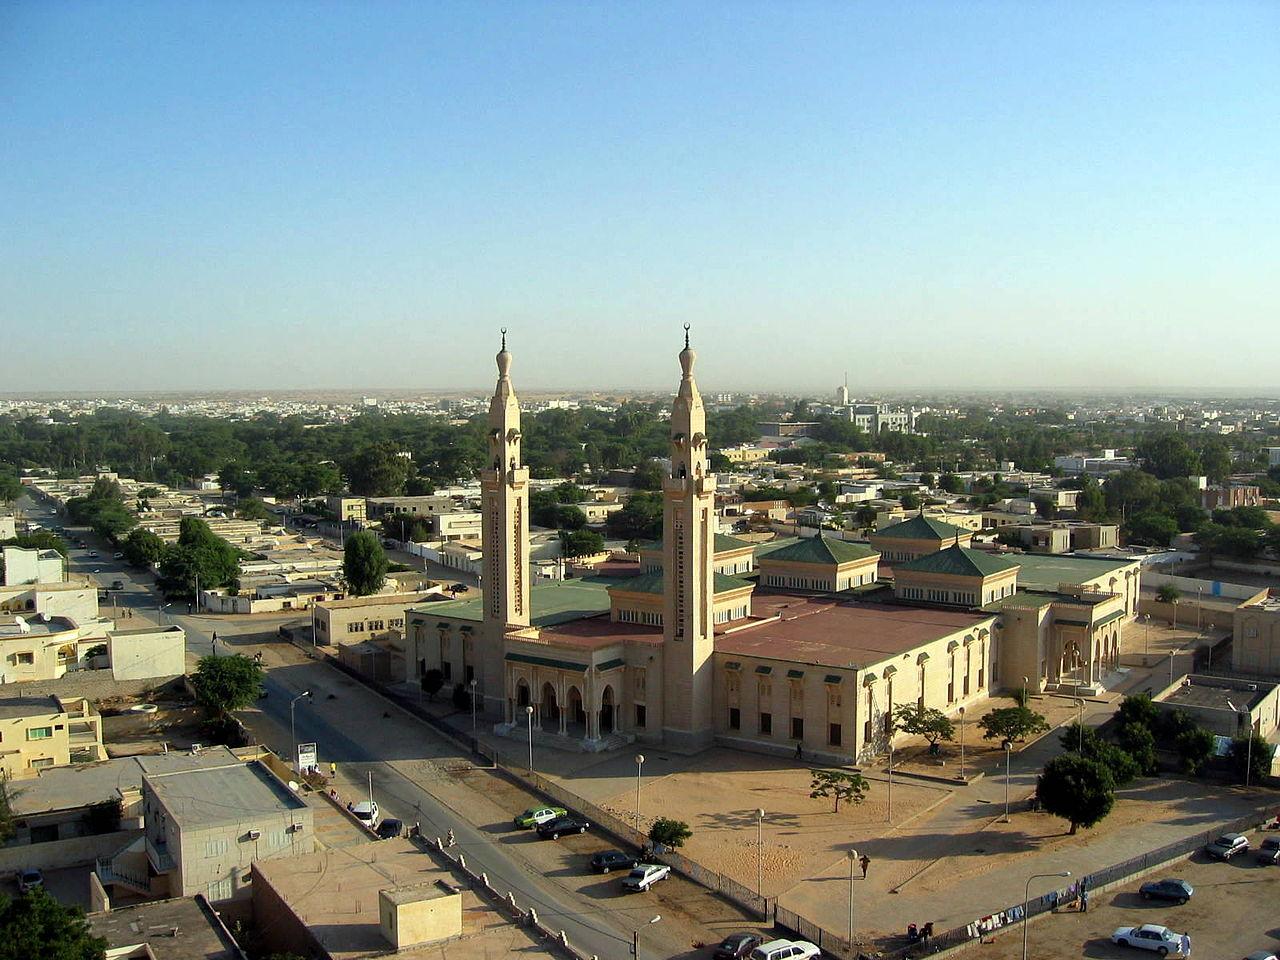 Nouakchott adalah ibu kota dan kota terbesar di Mauritania. Ini adalah salah satu kota terbesar di Sahara.